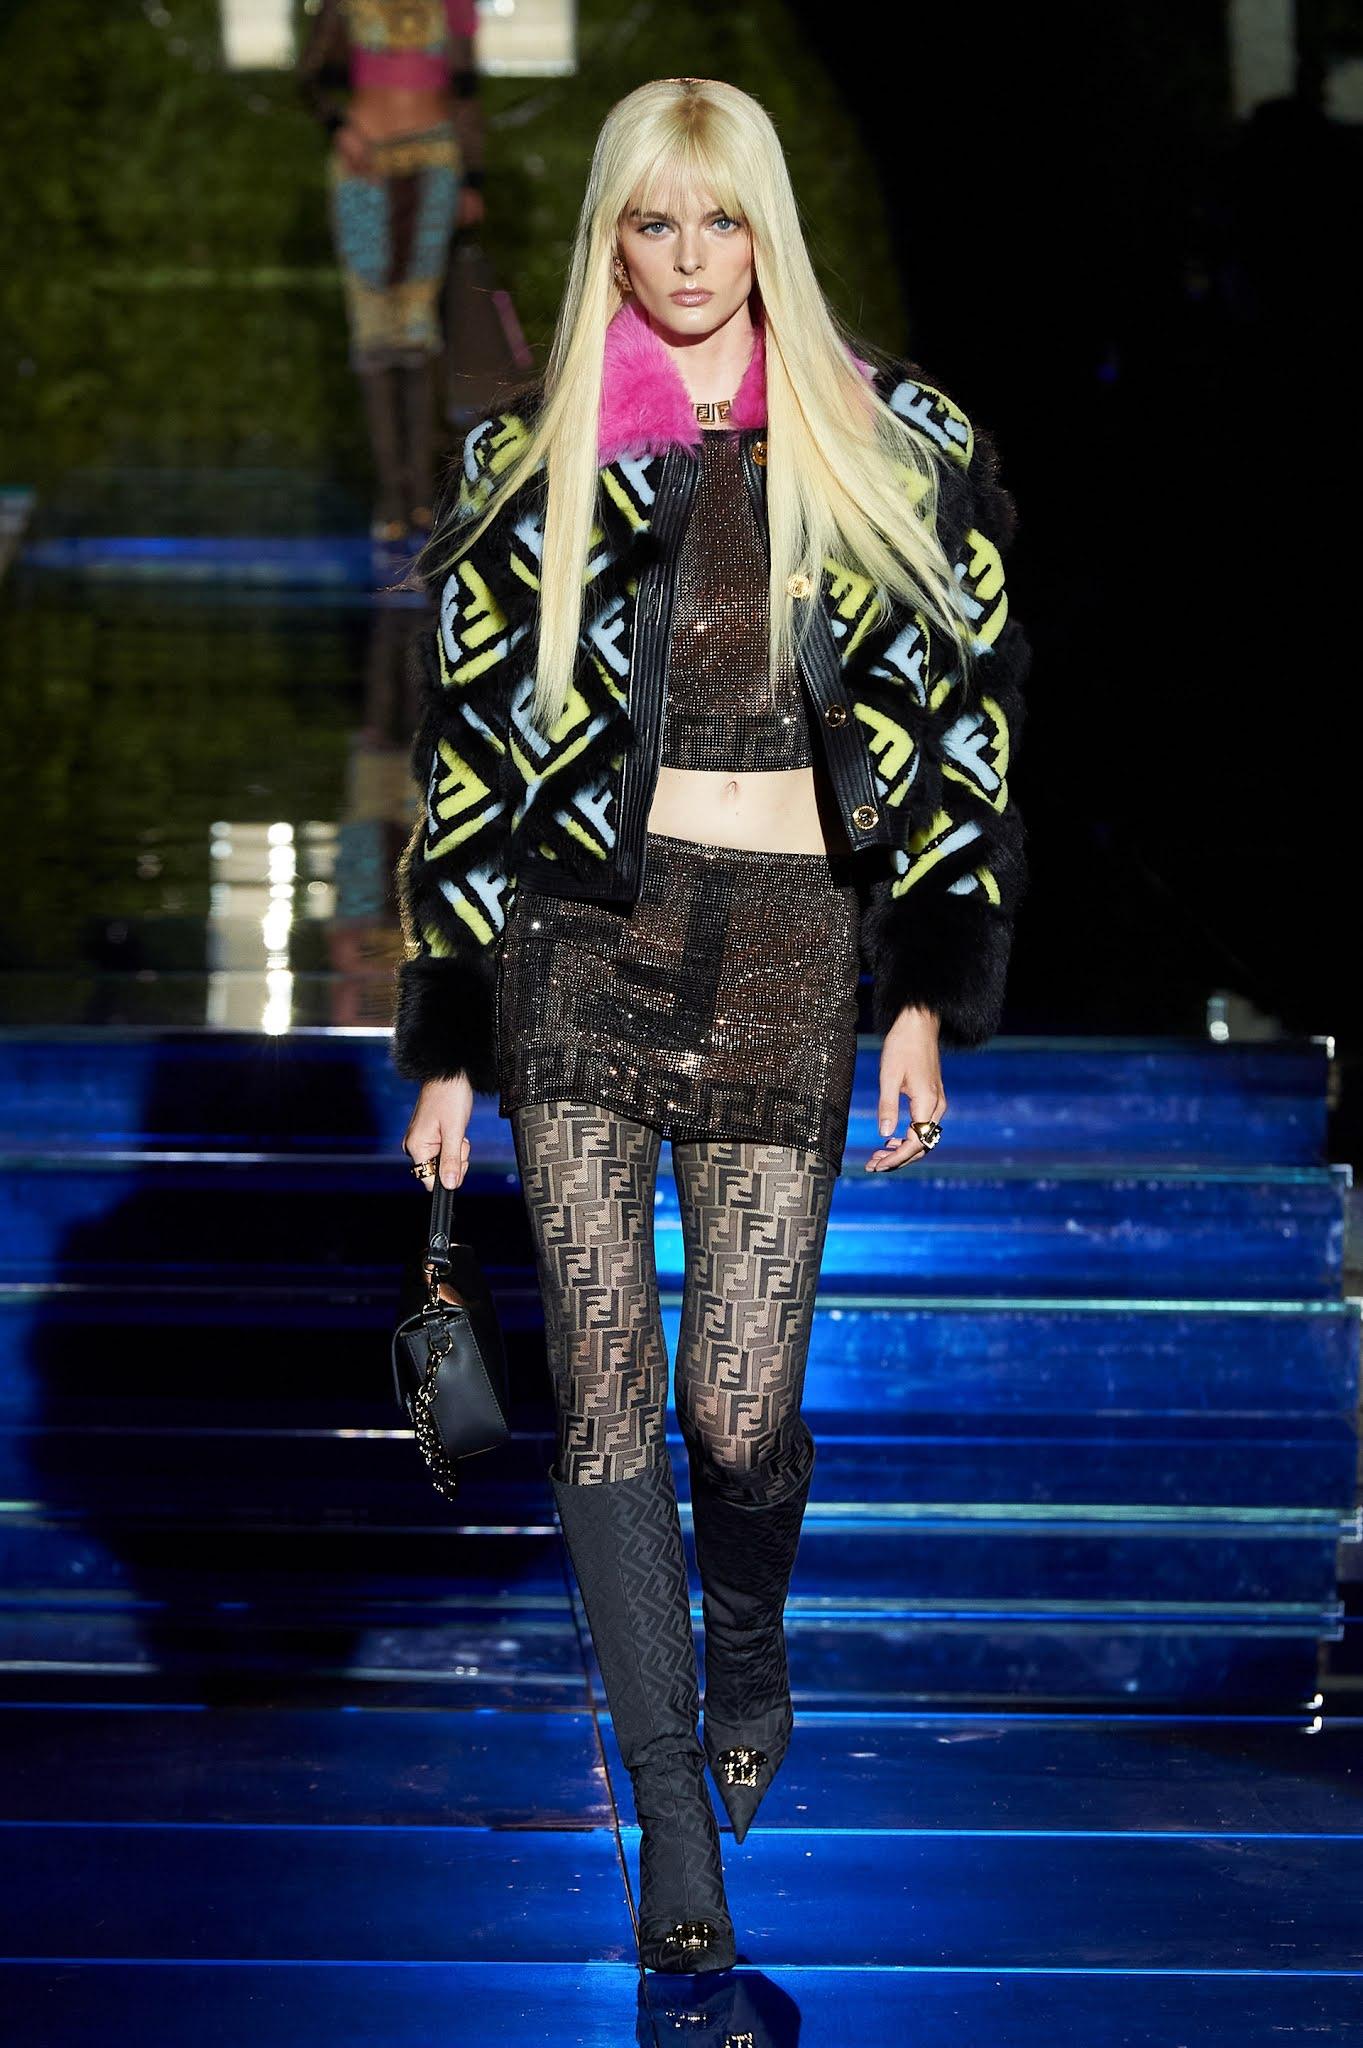 Versace x Fendi - FENDACE Collection